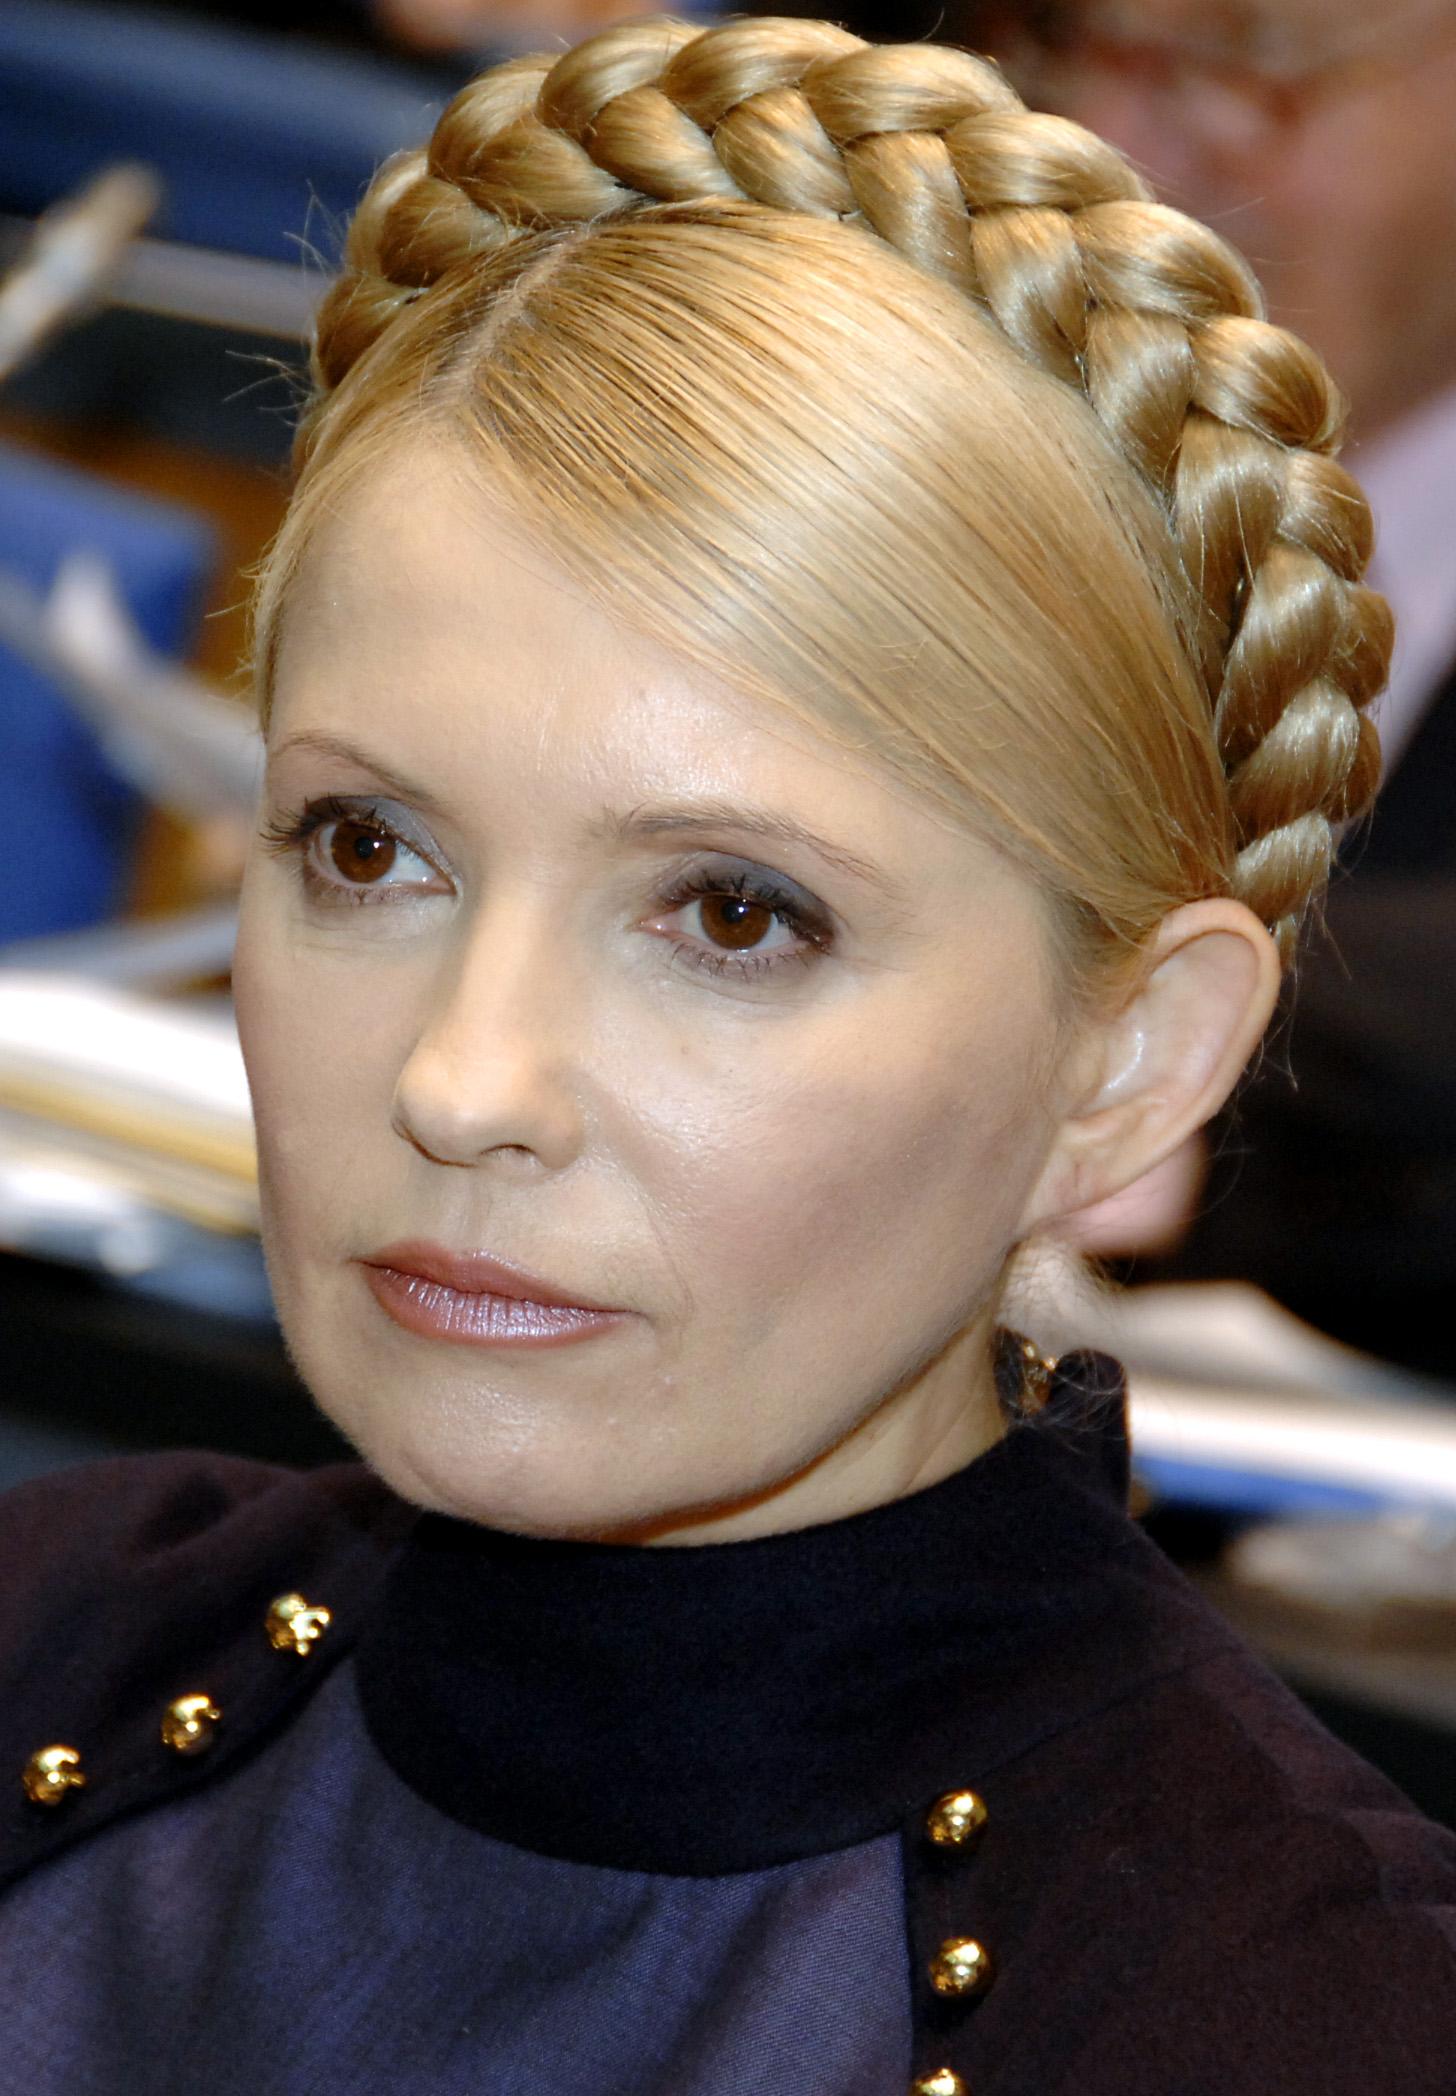 Tymoshenko the blonde princess leah